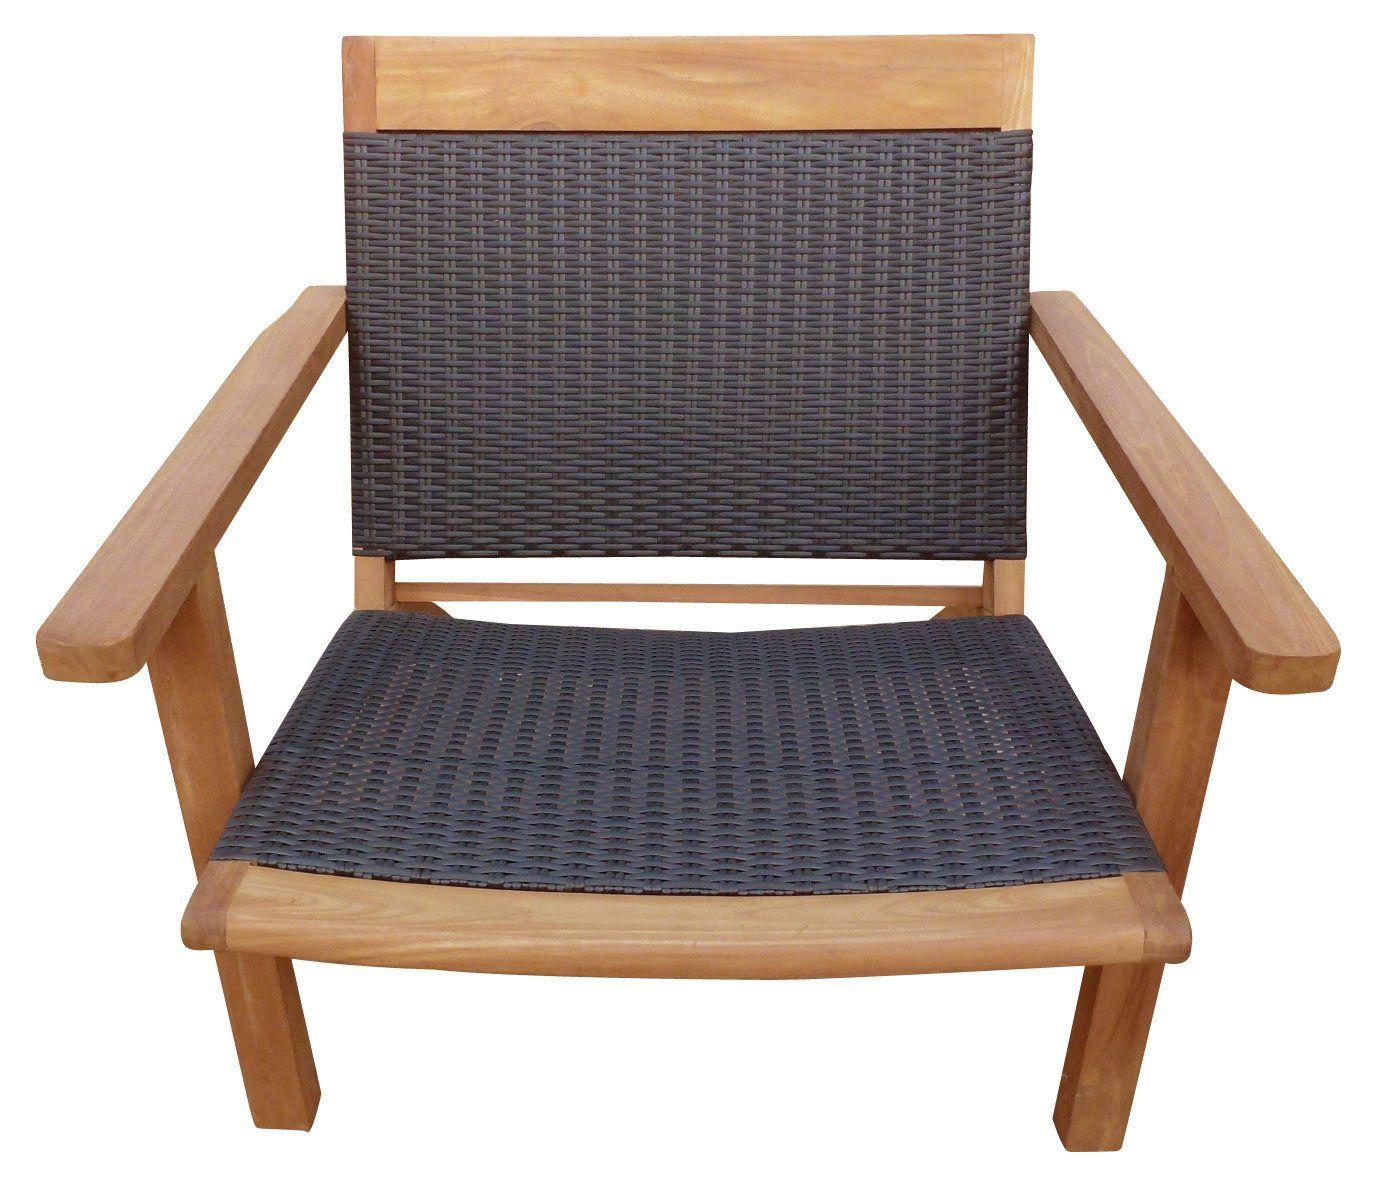 Teak Wood Barcelona Patio Lounge And